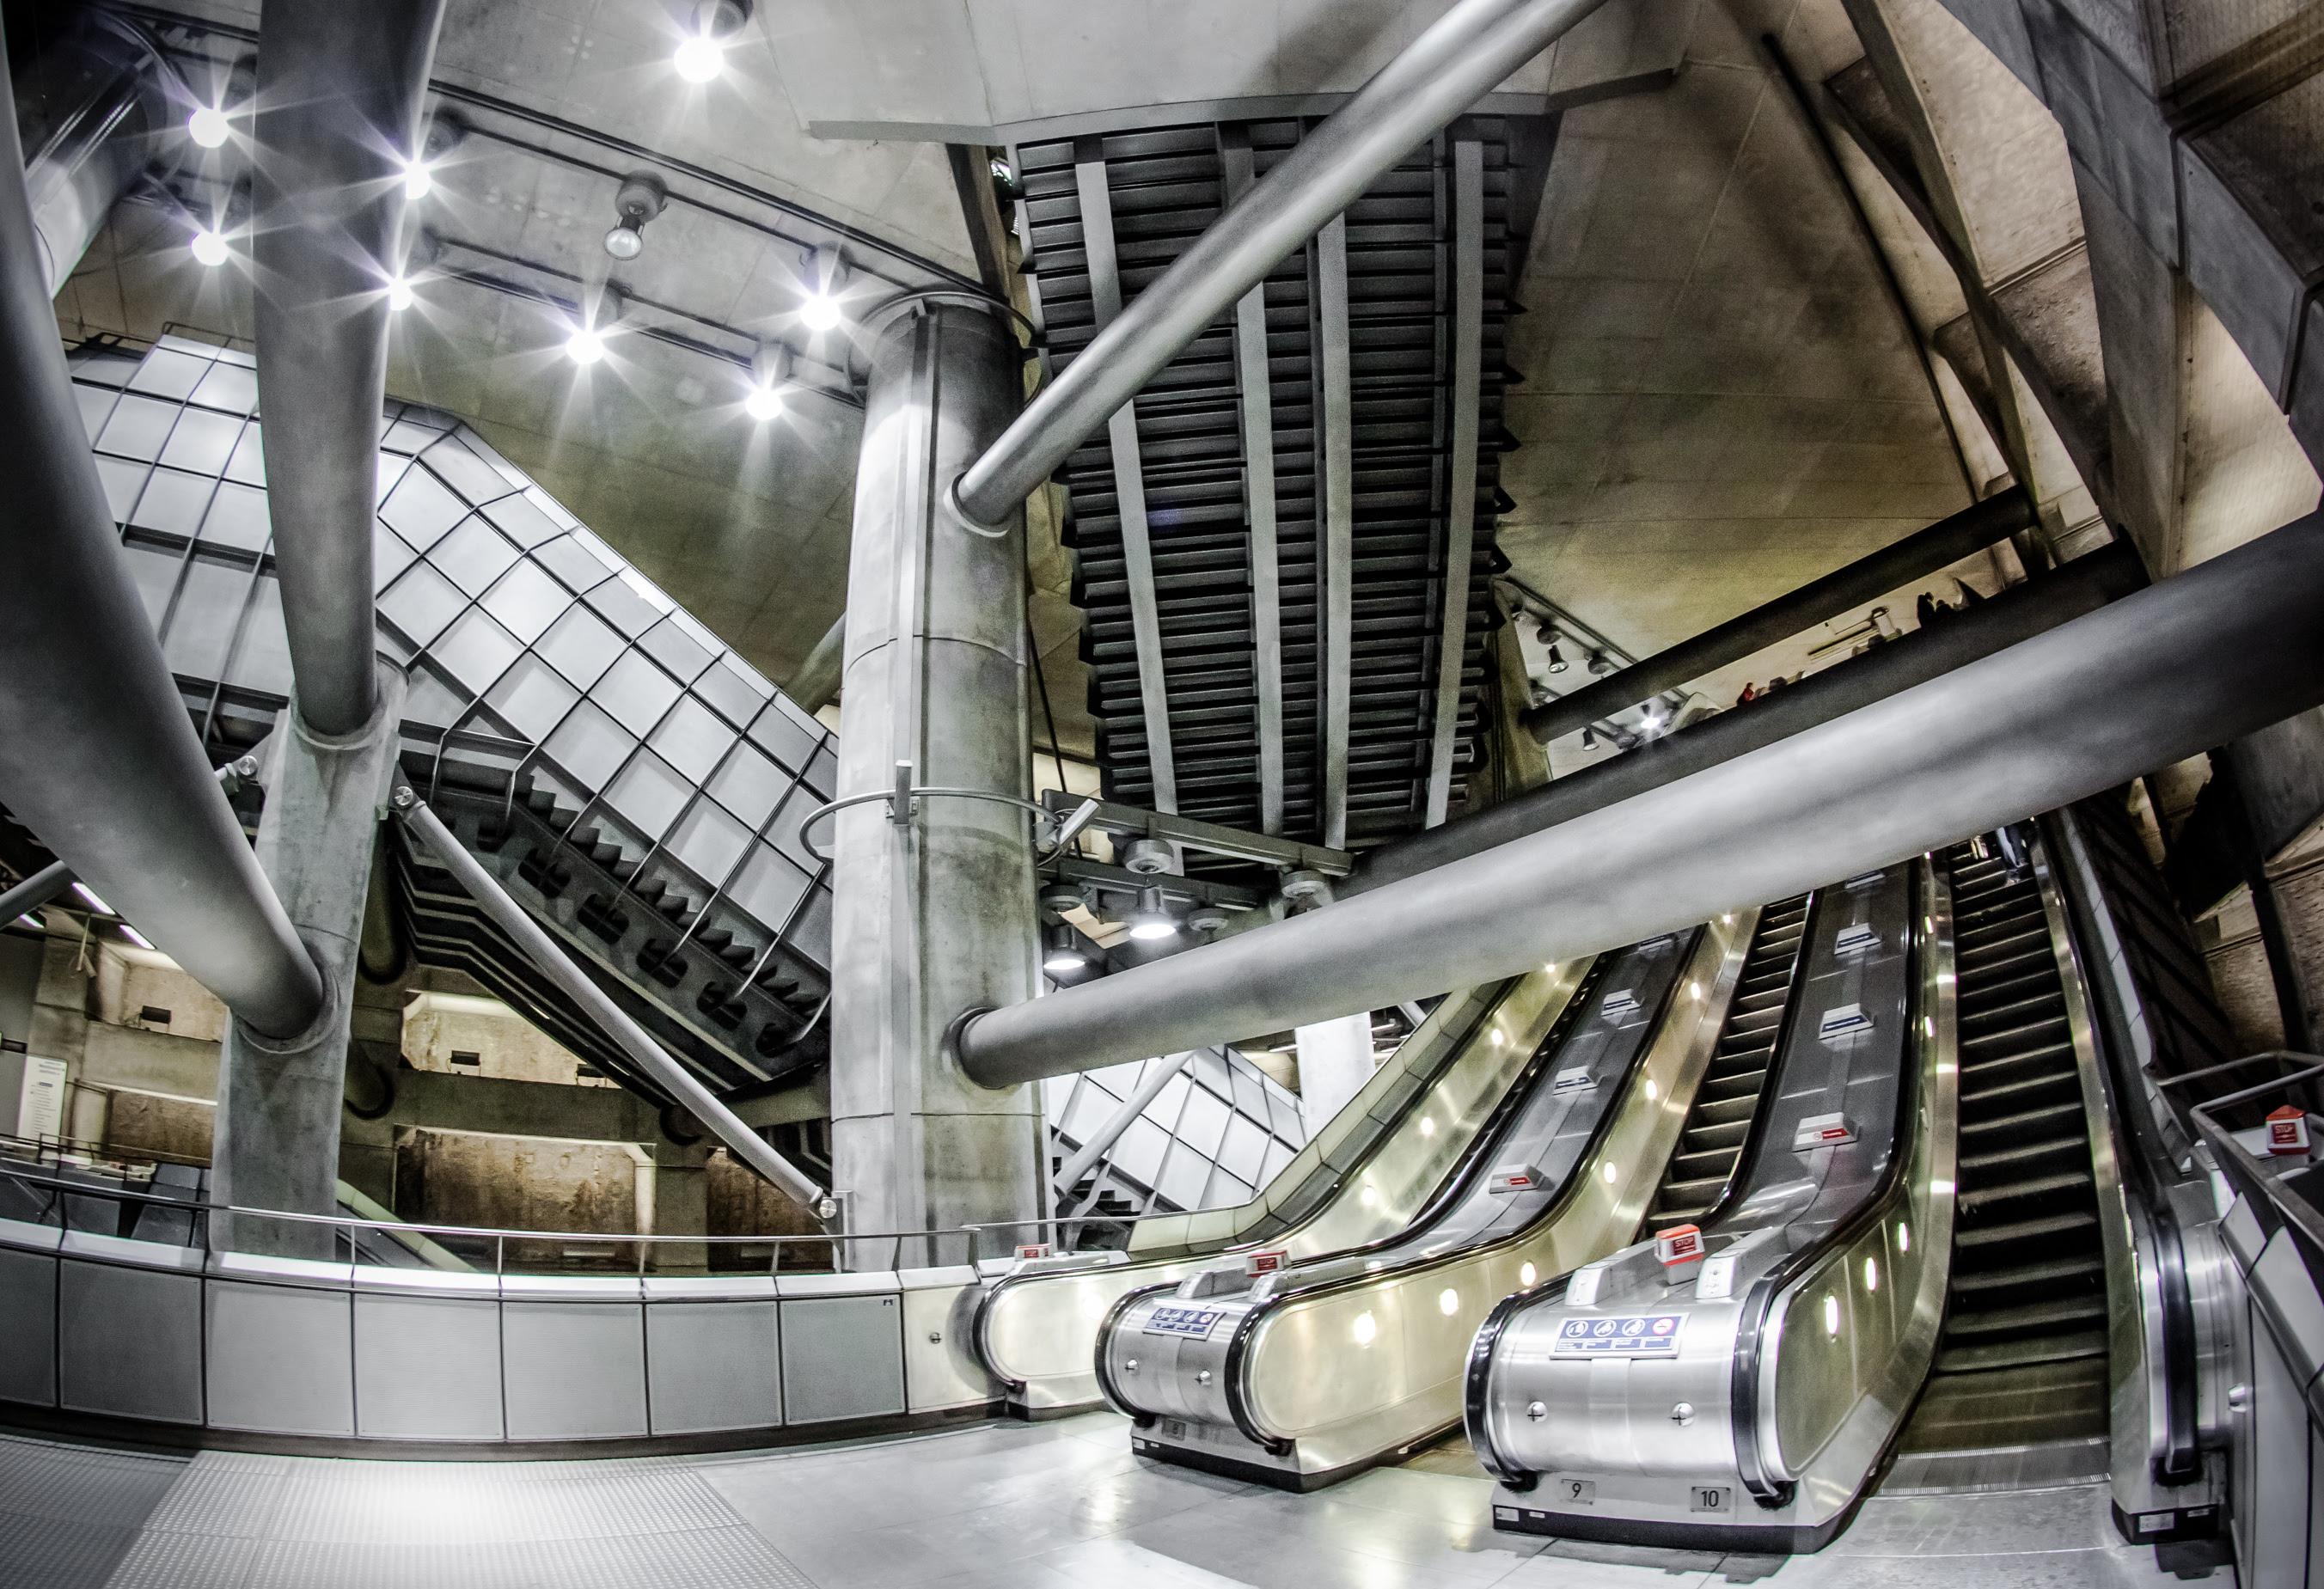 Galleries - Architecture - London Architecture - - Fubiz™